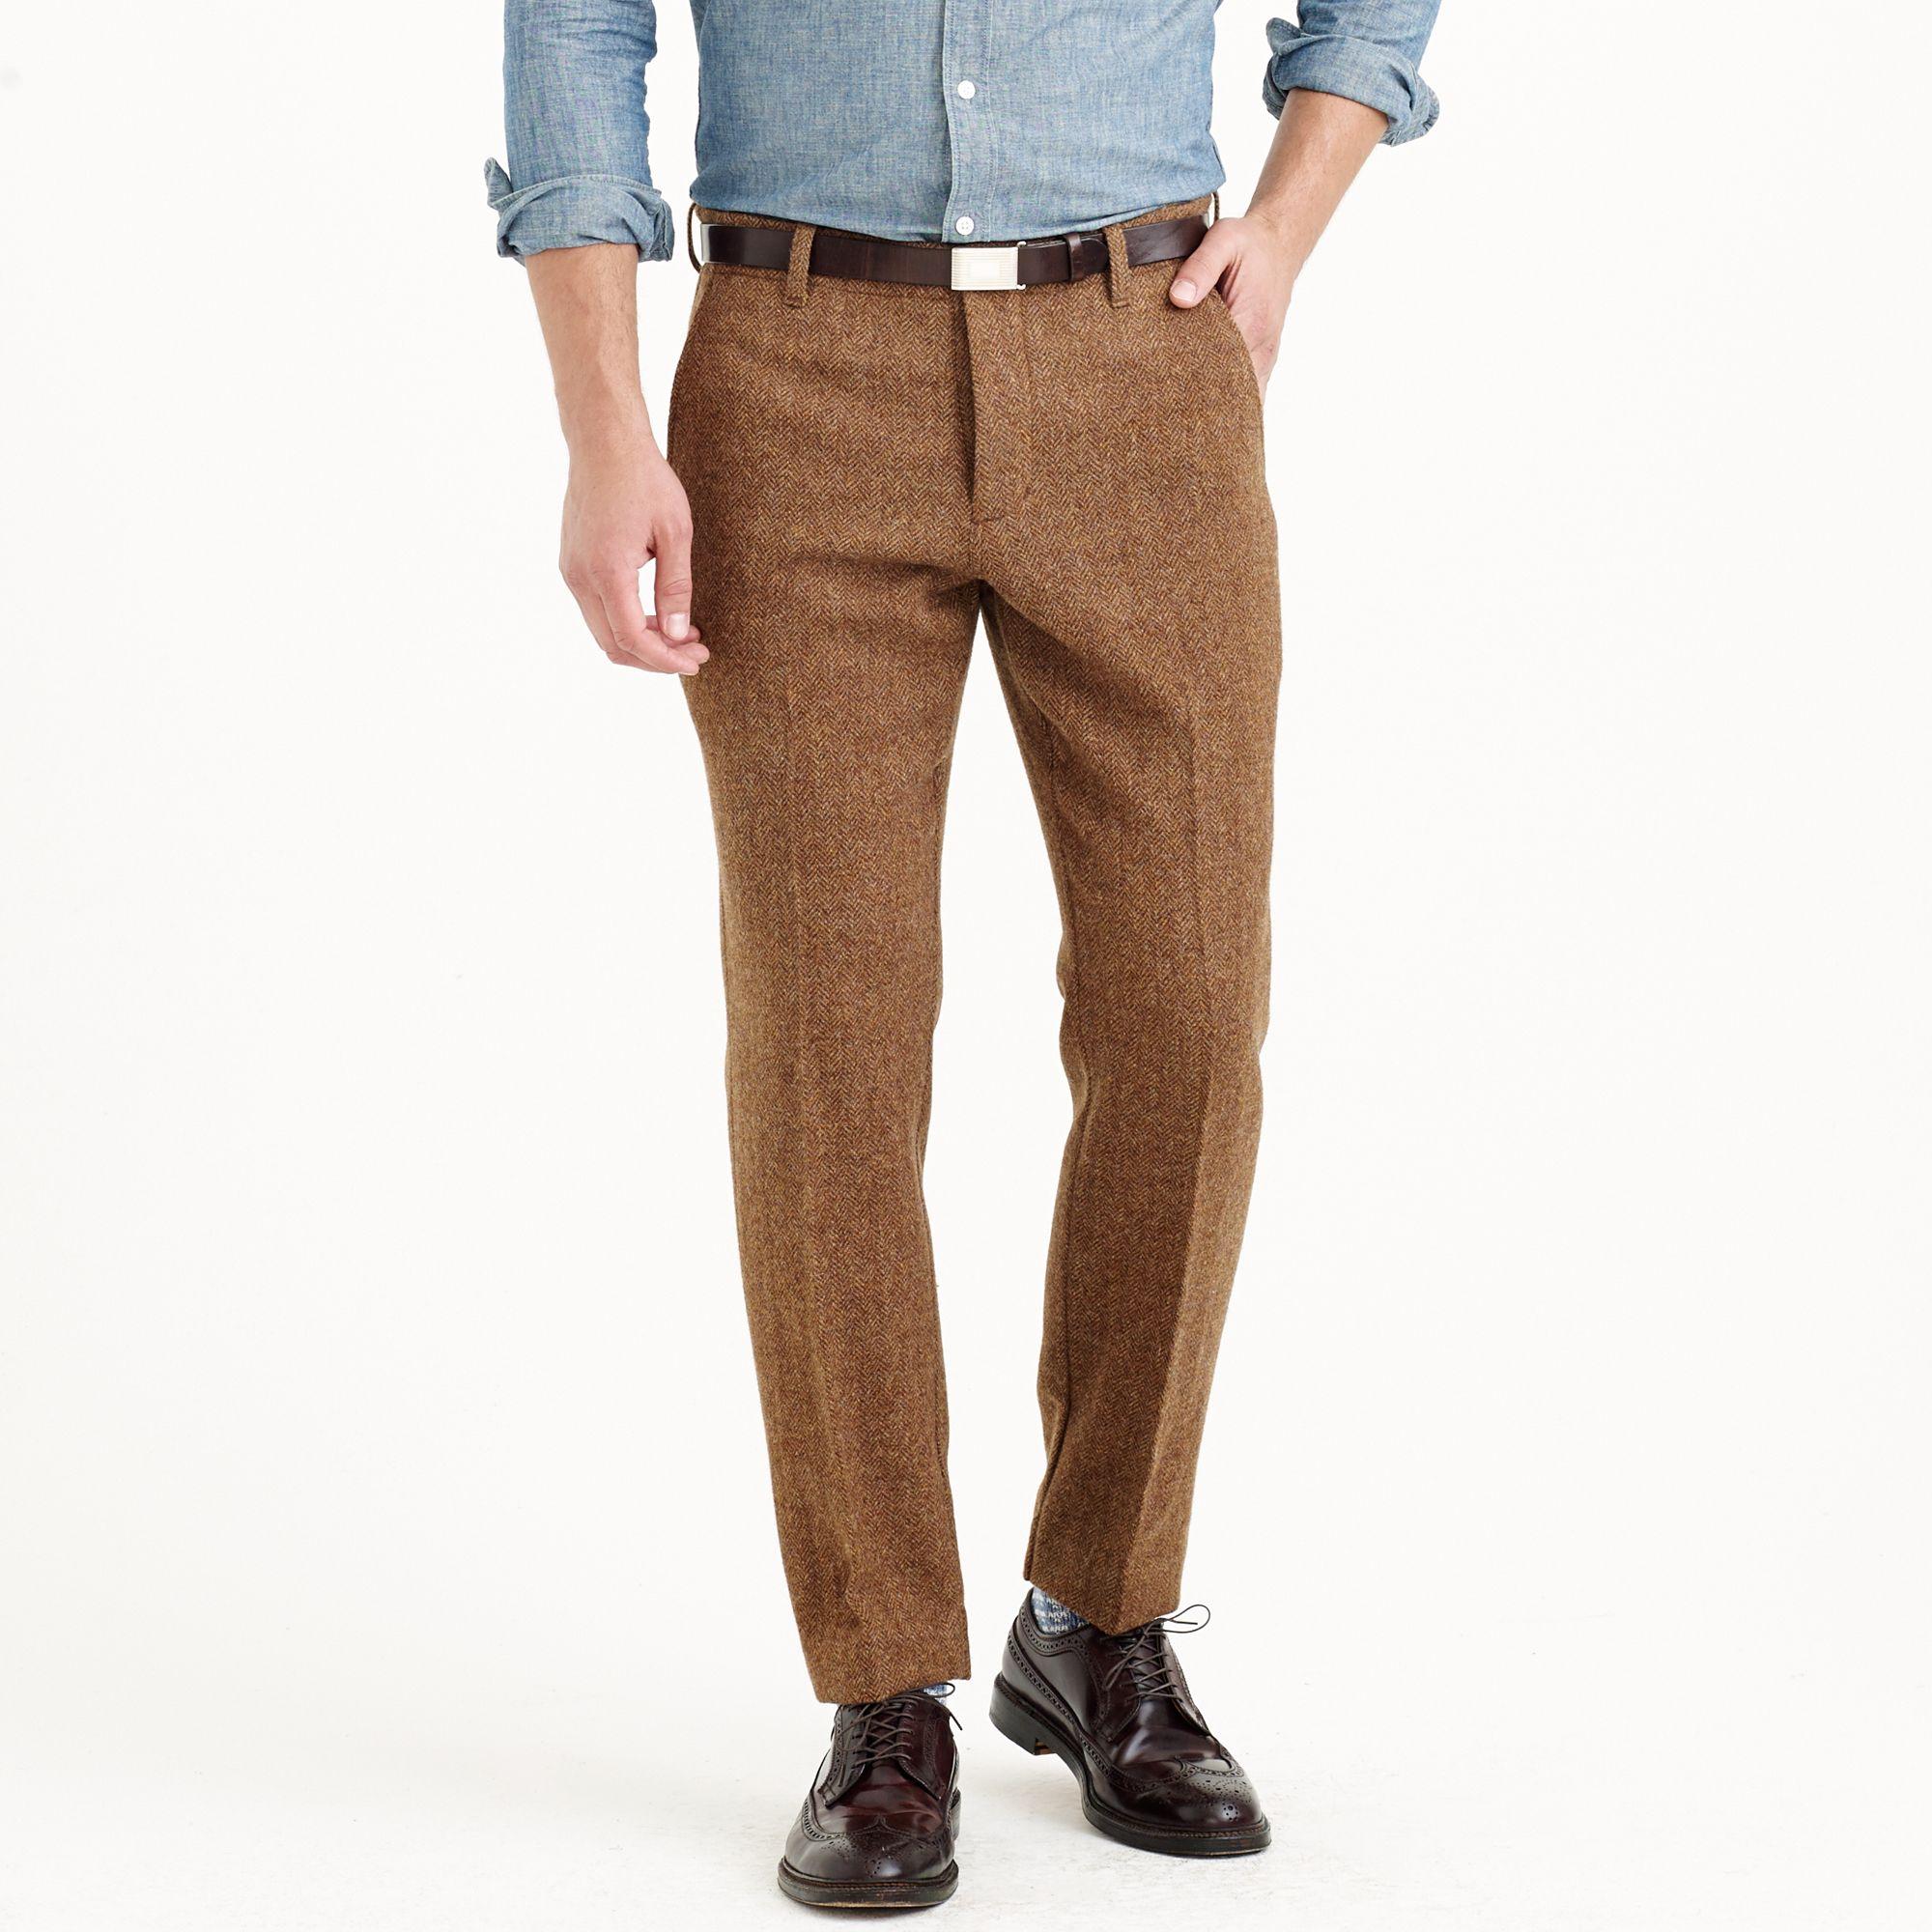 J Crew Wallace Barnes Suit Pant In Herringbone English